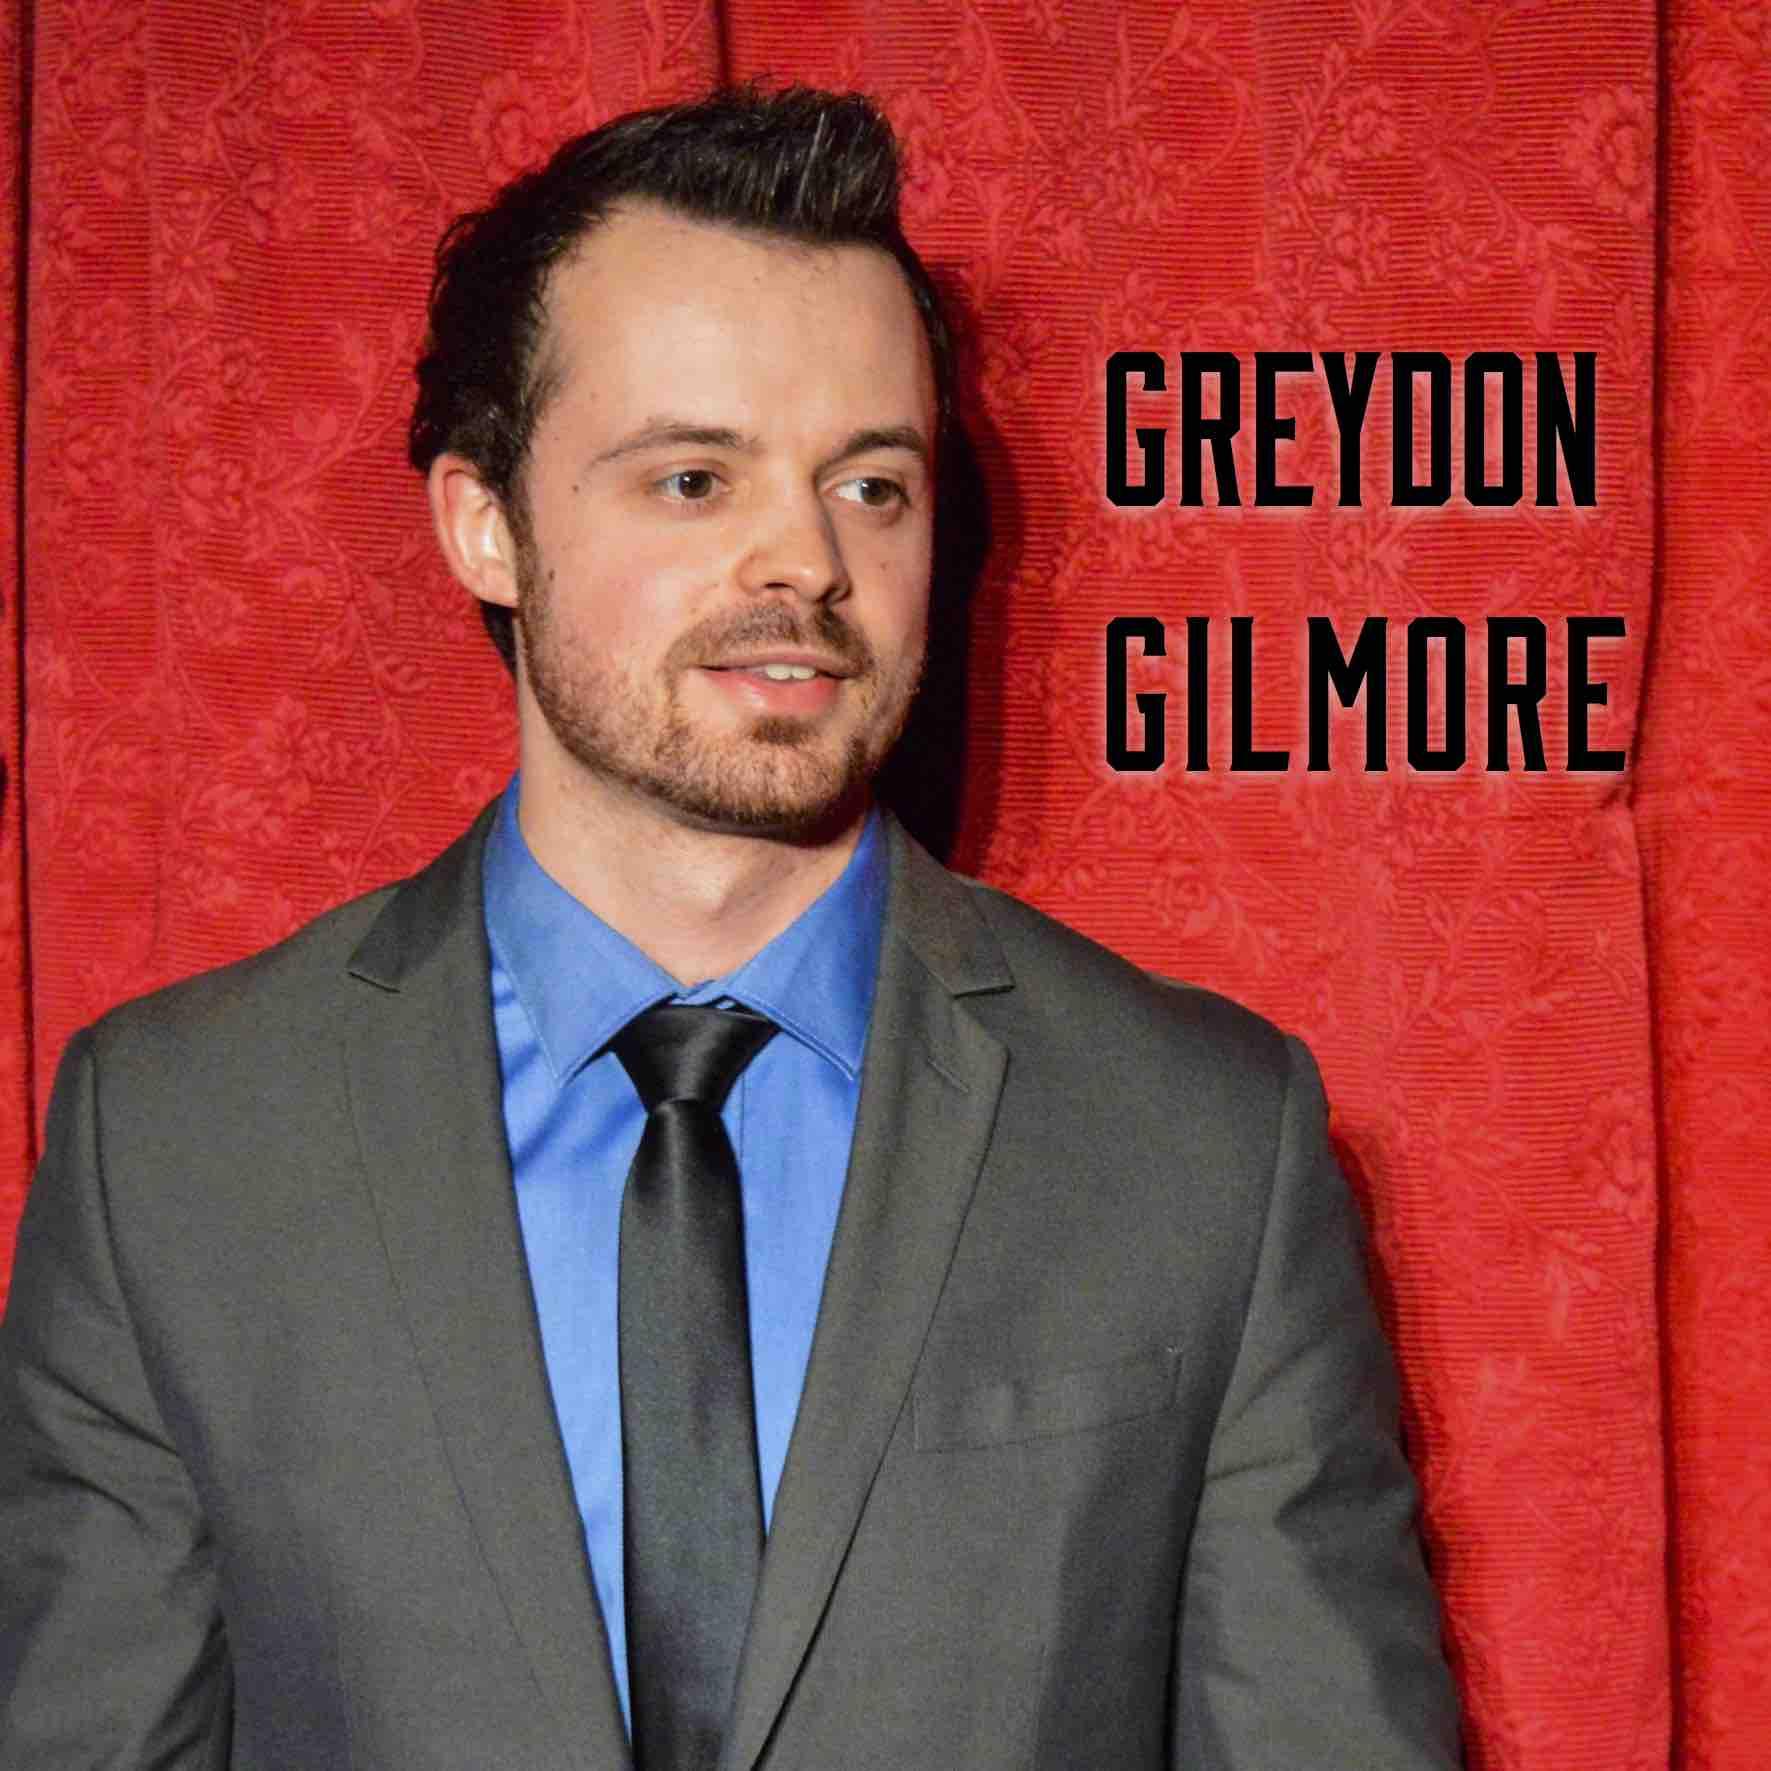 Gilmore-Greydon.jpg